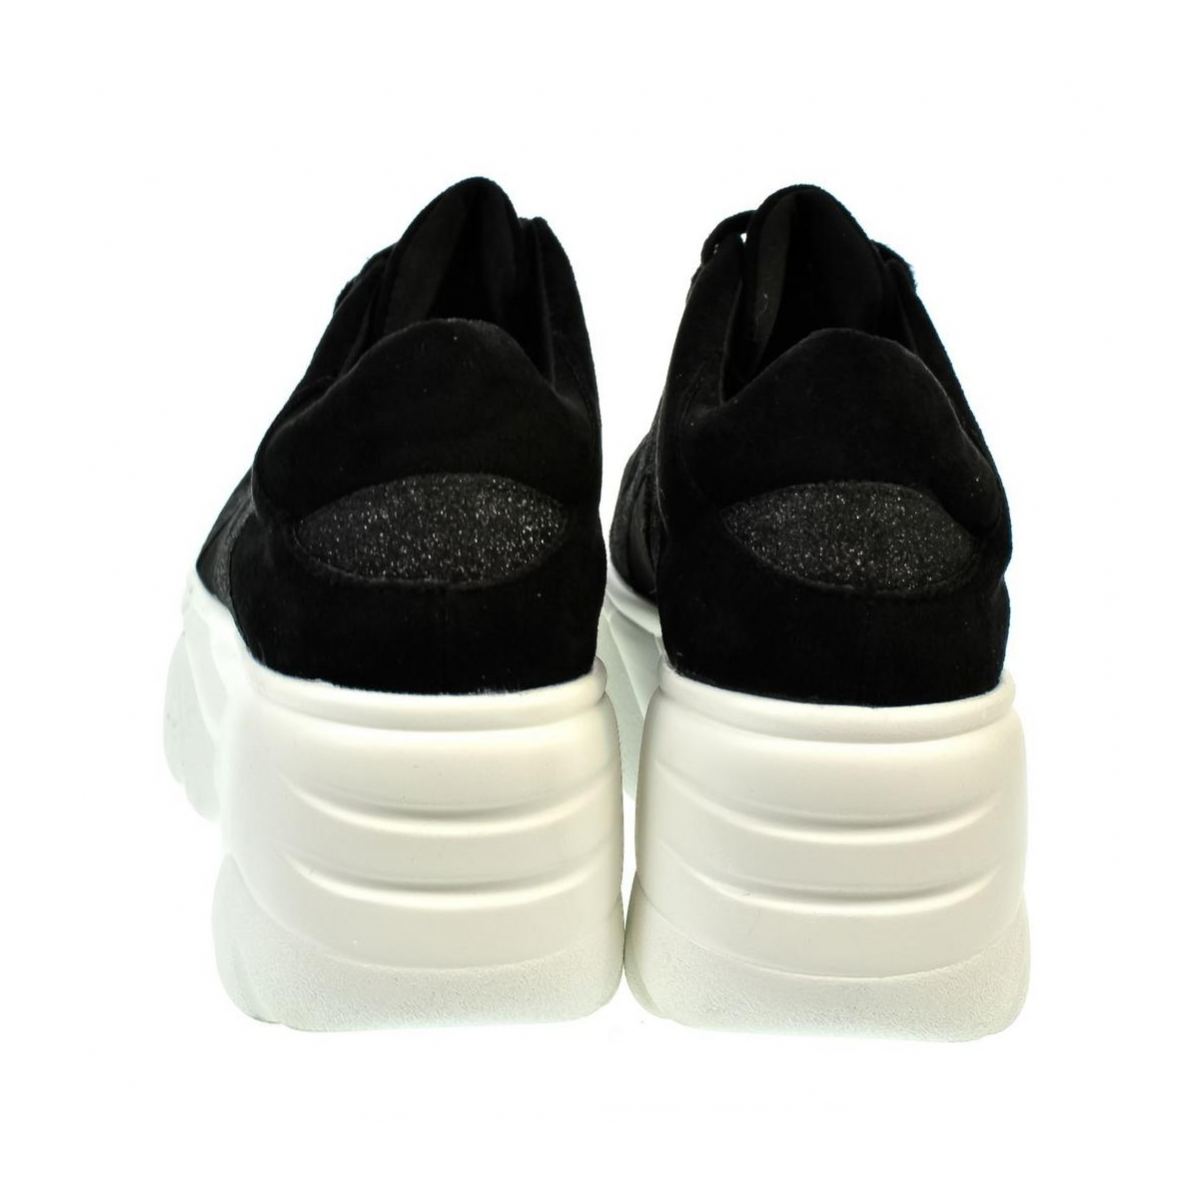 Dámske čierne tenisky TRIBI - 3 e635c760e54